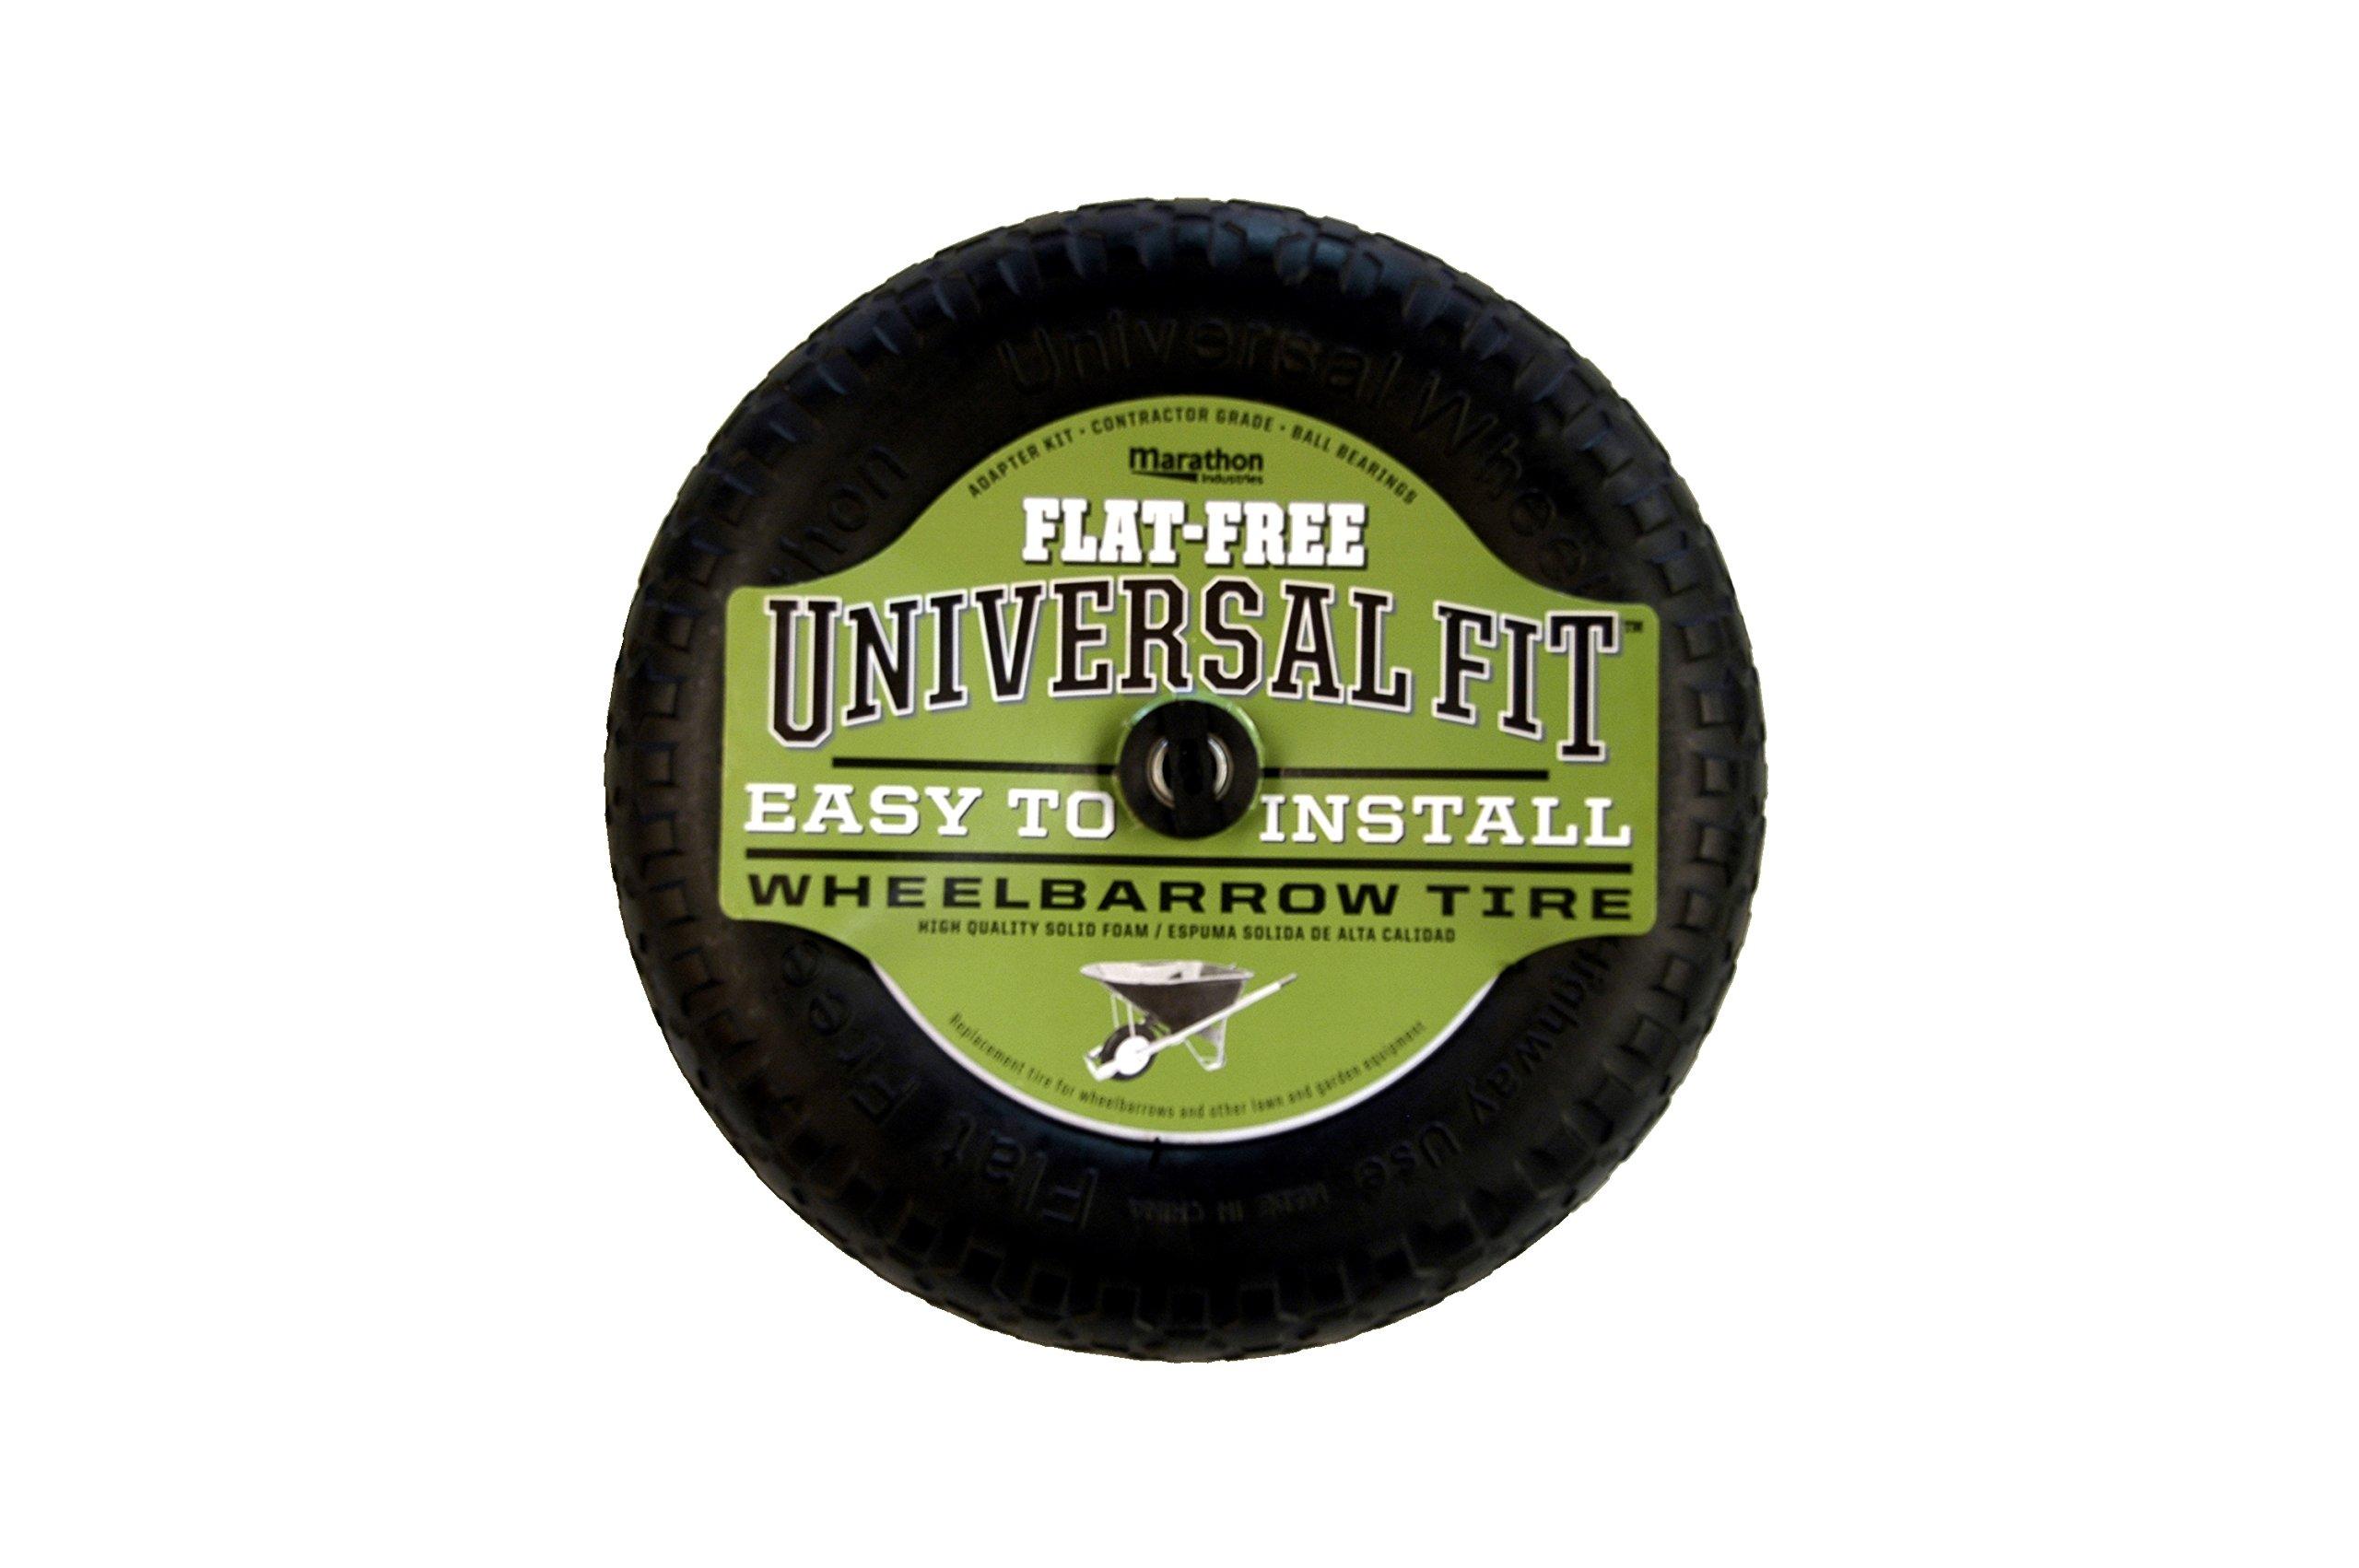 Arnold Marathon 14.5 Universal Flat-Free Replacement Wheelbarrow Wheel